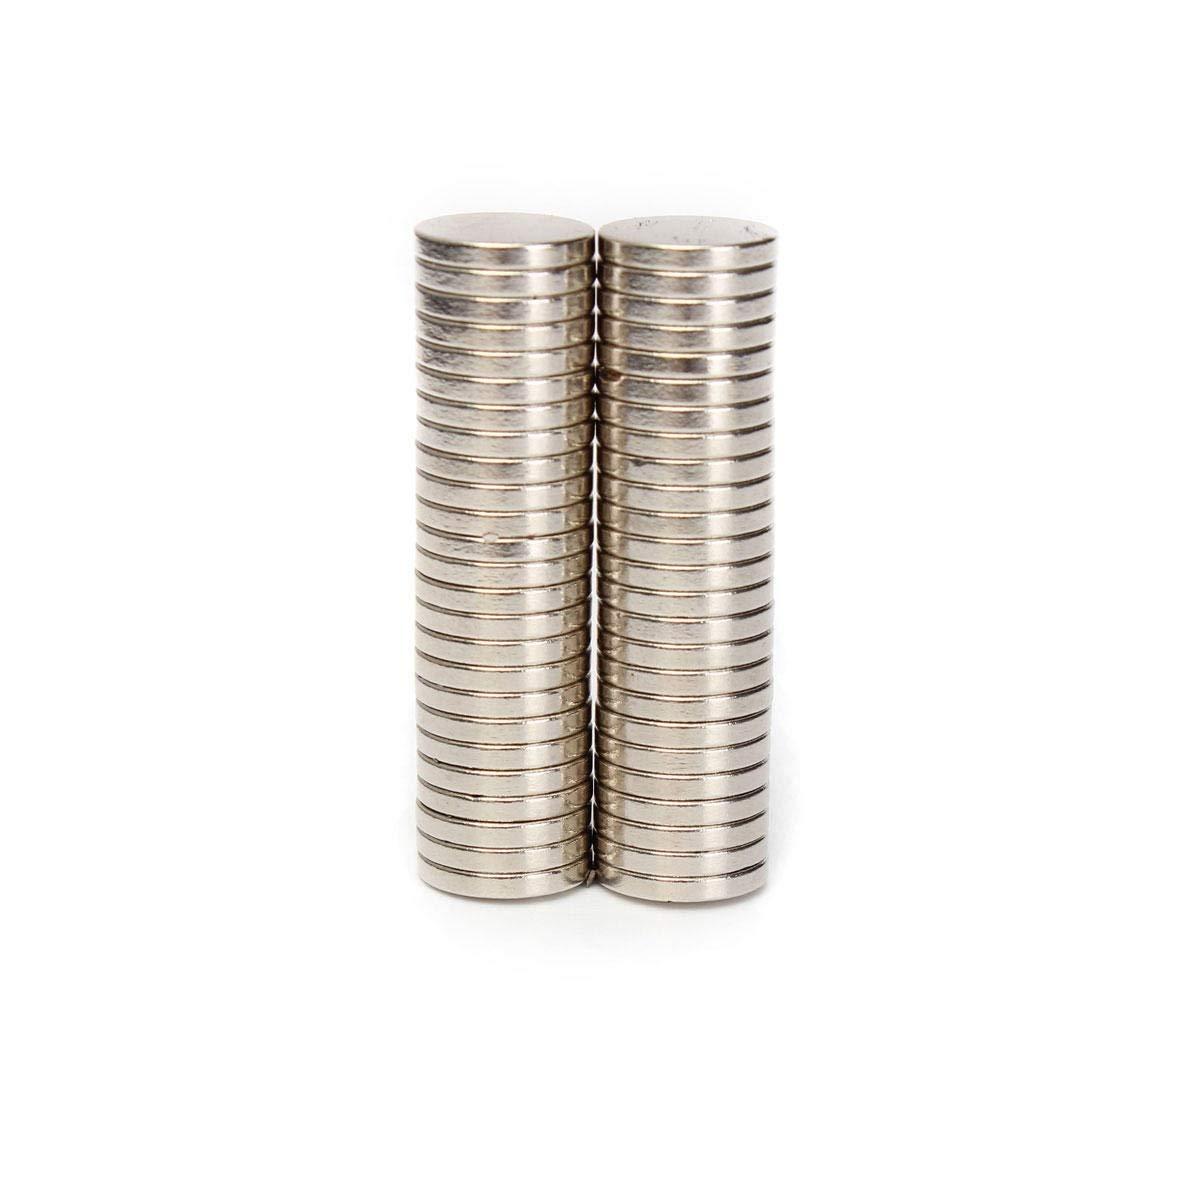 Neodym-Magnet 50pcs N50 12mm x 2mm Erde Neodym-Magneten Starke Runde Magnete Seltene